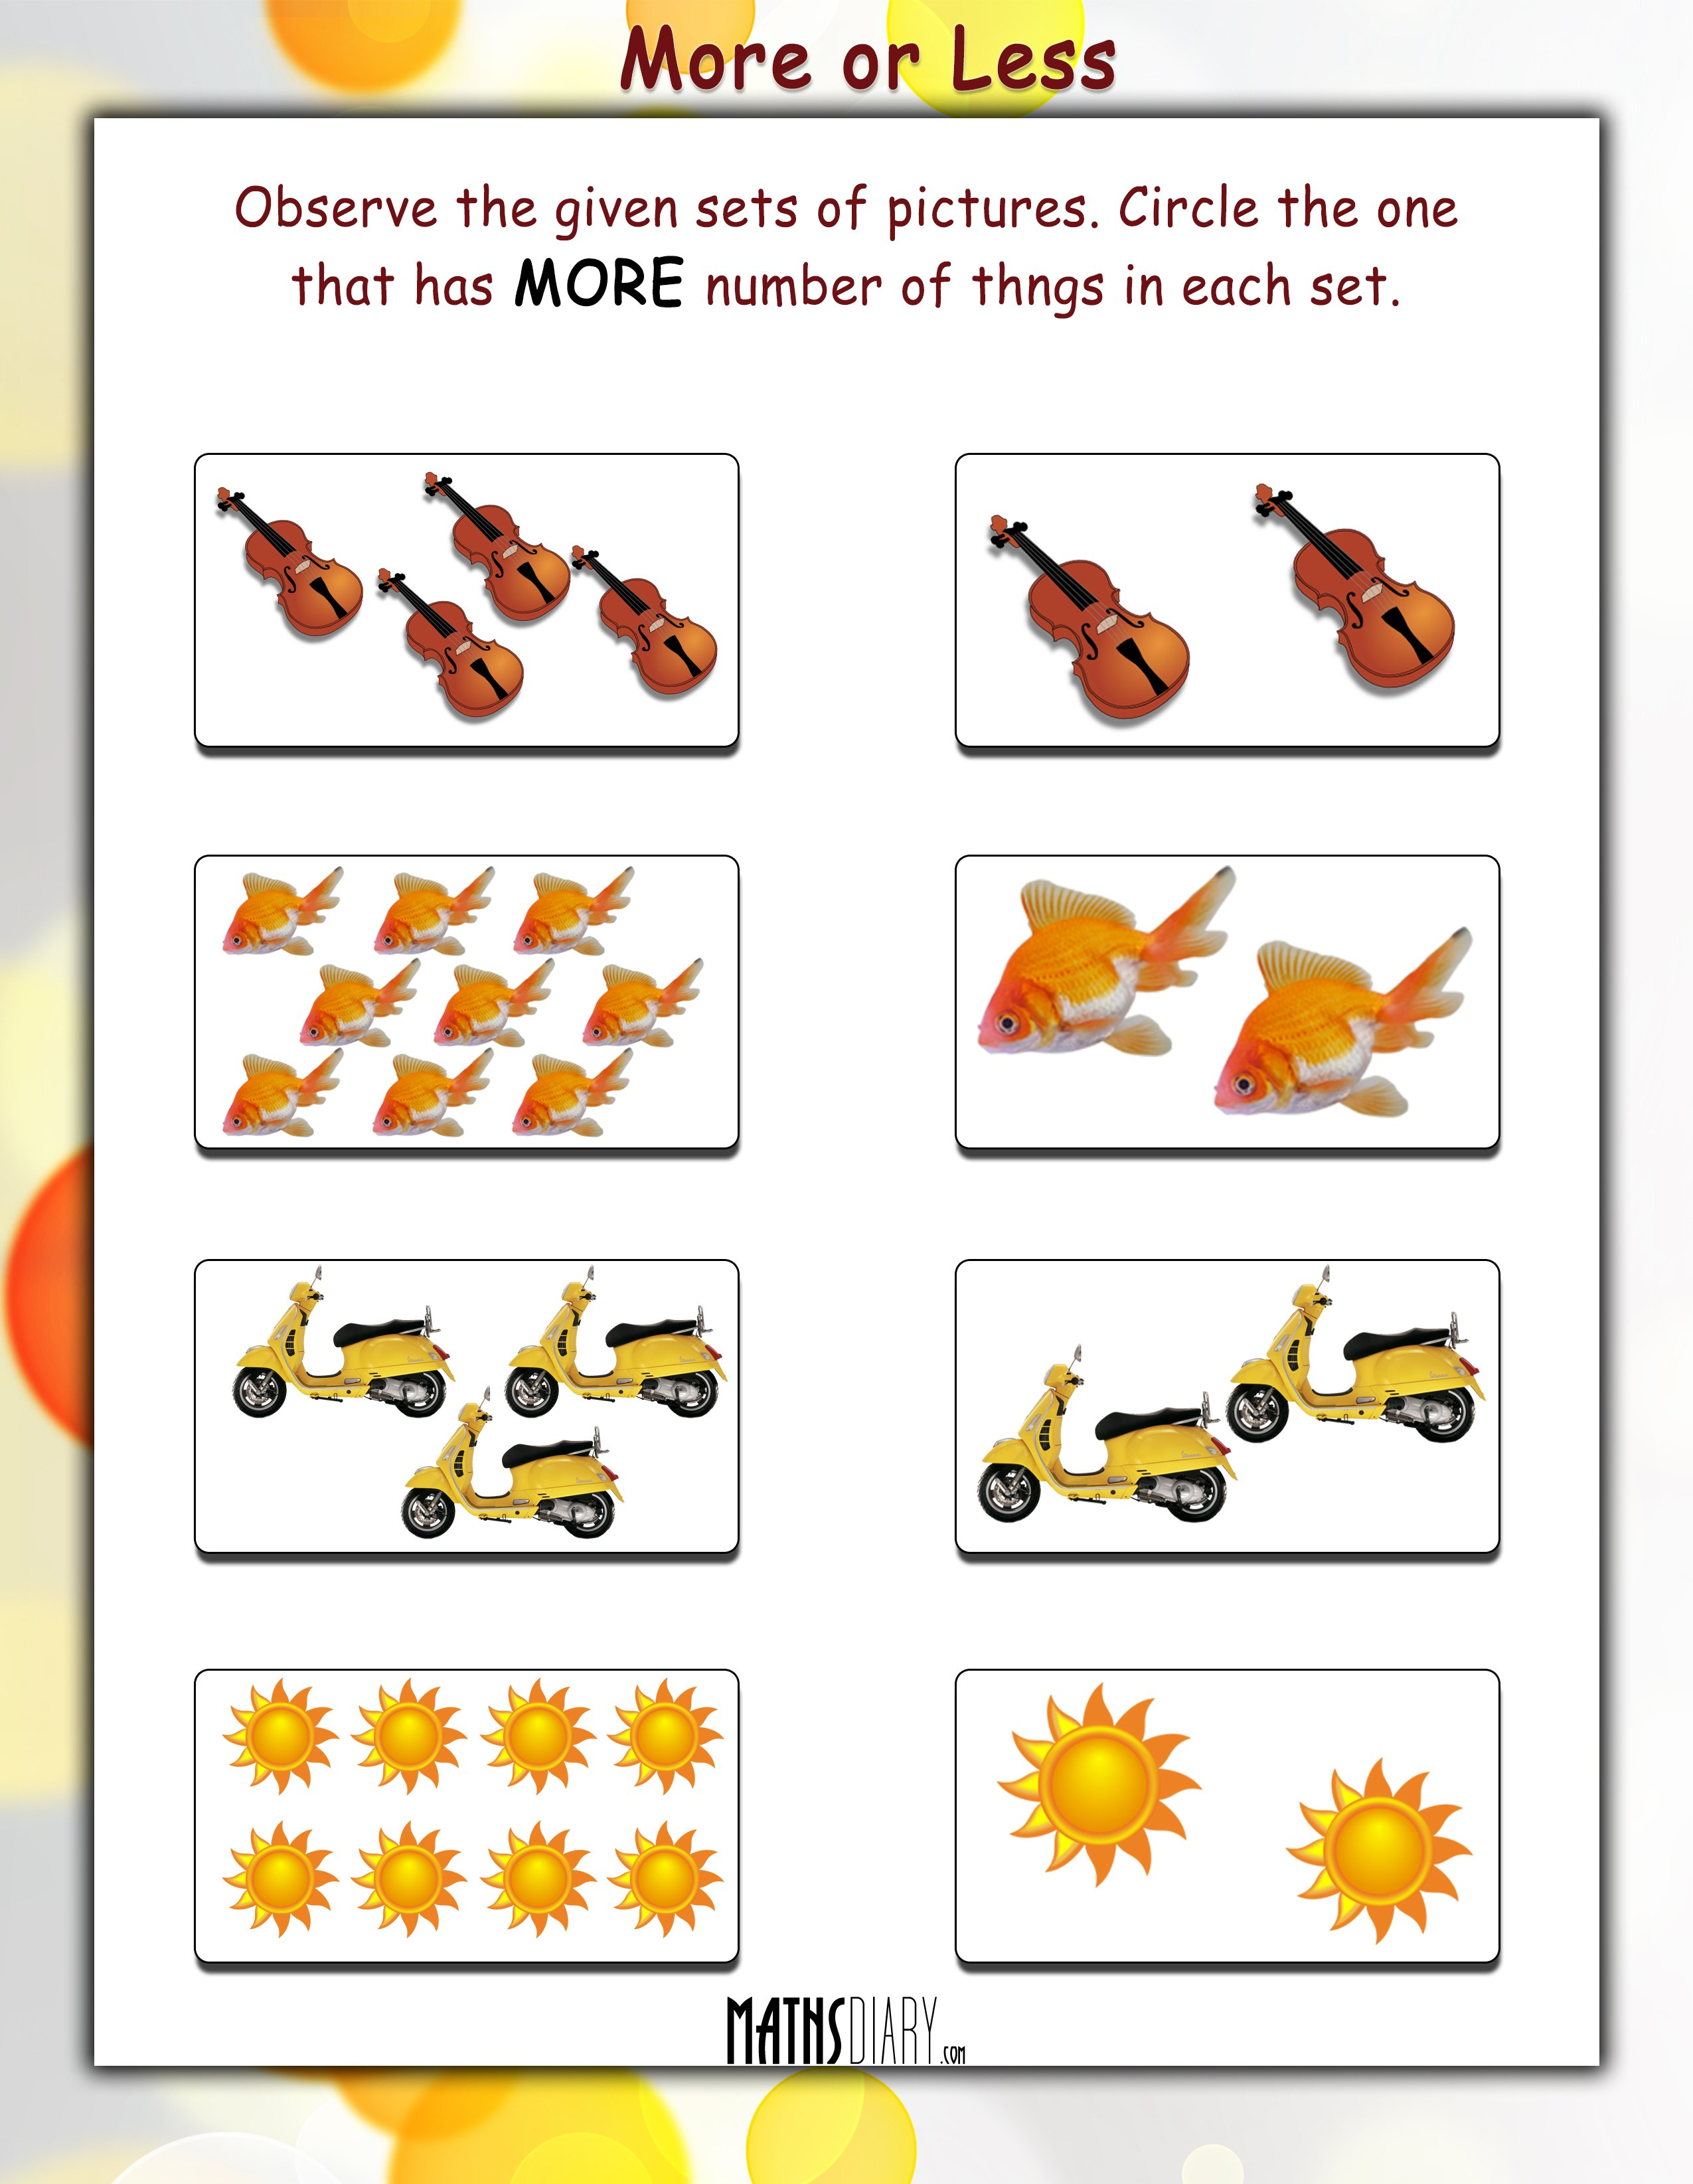 Practical Maths - LKG Math Worksheets - Page 3